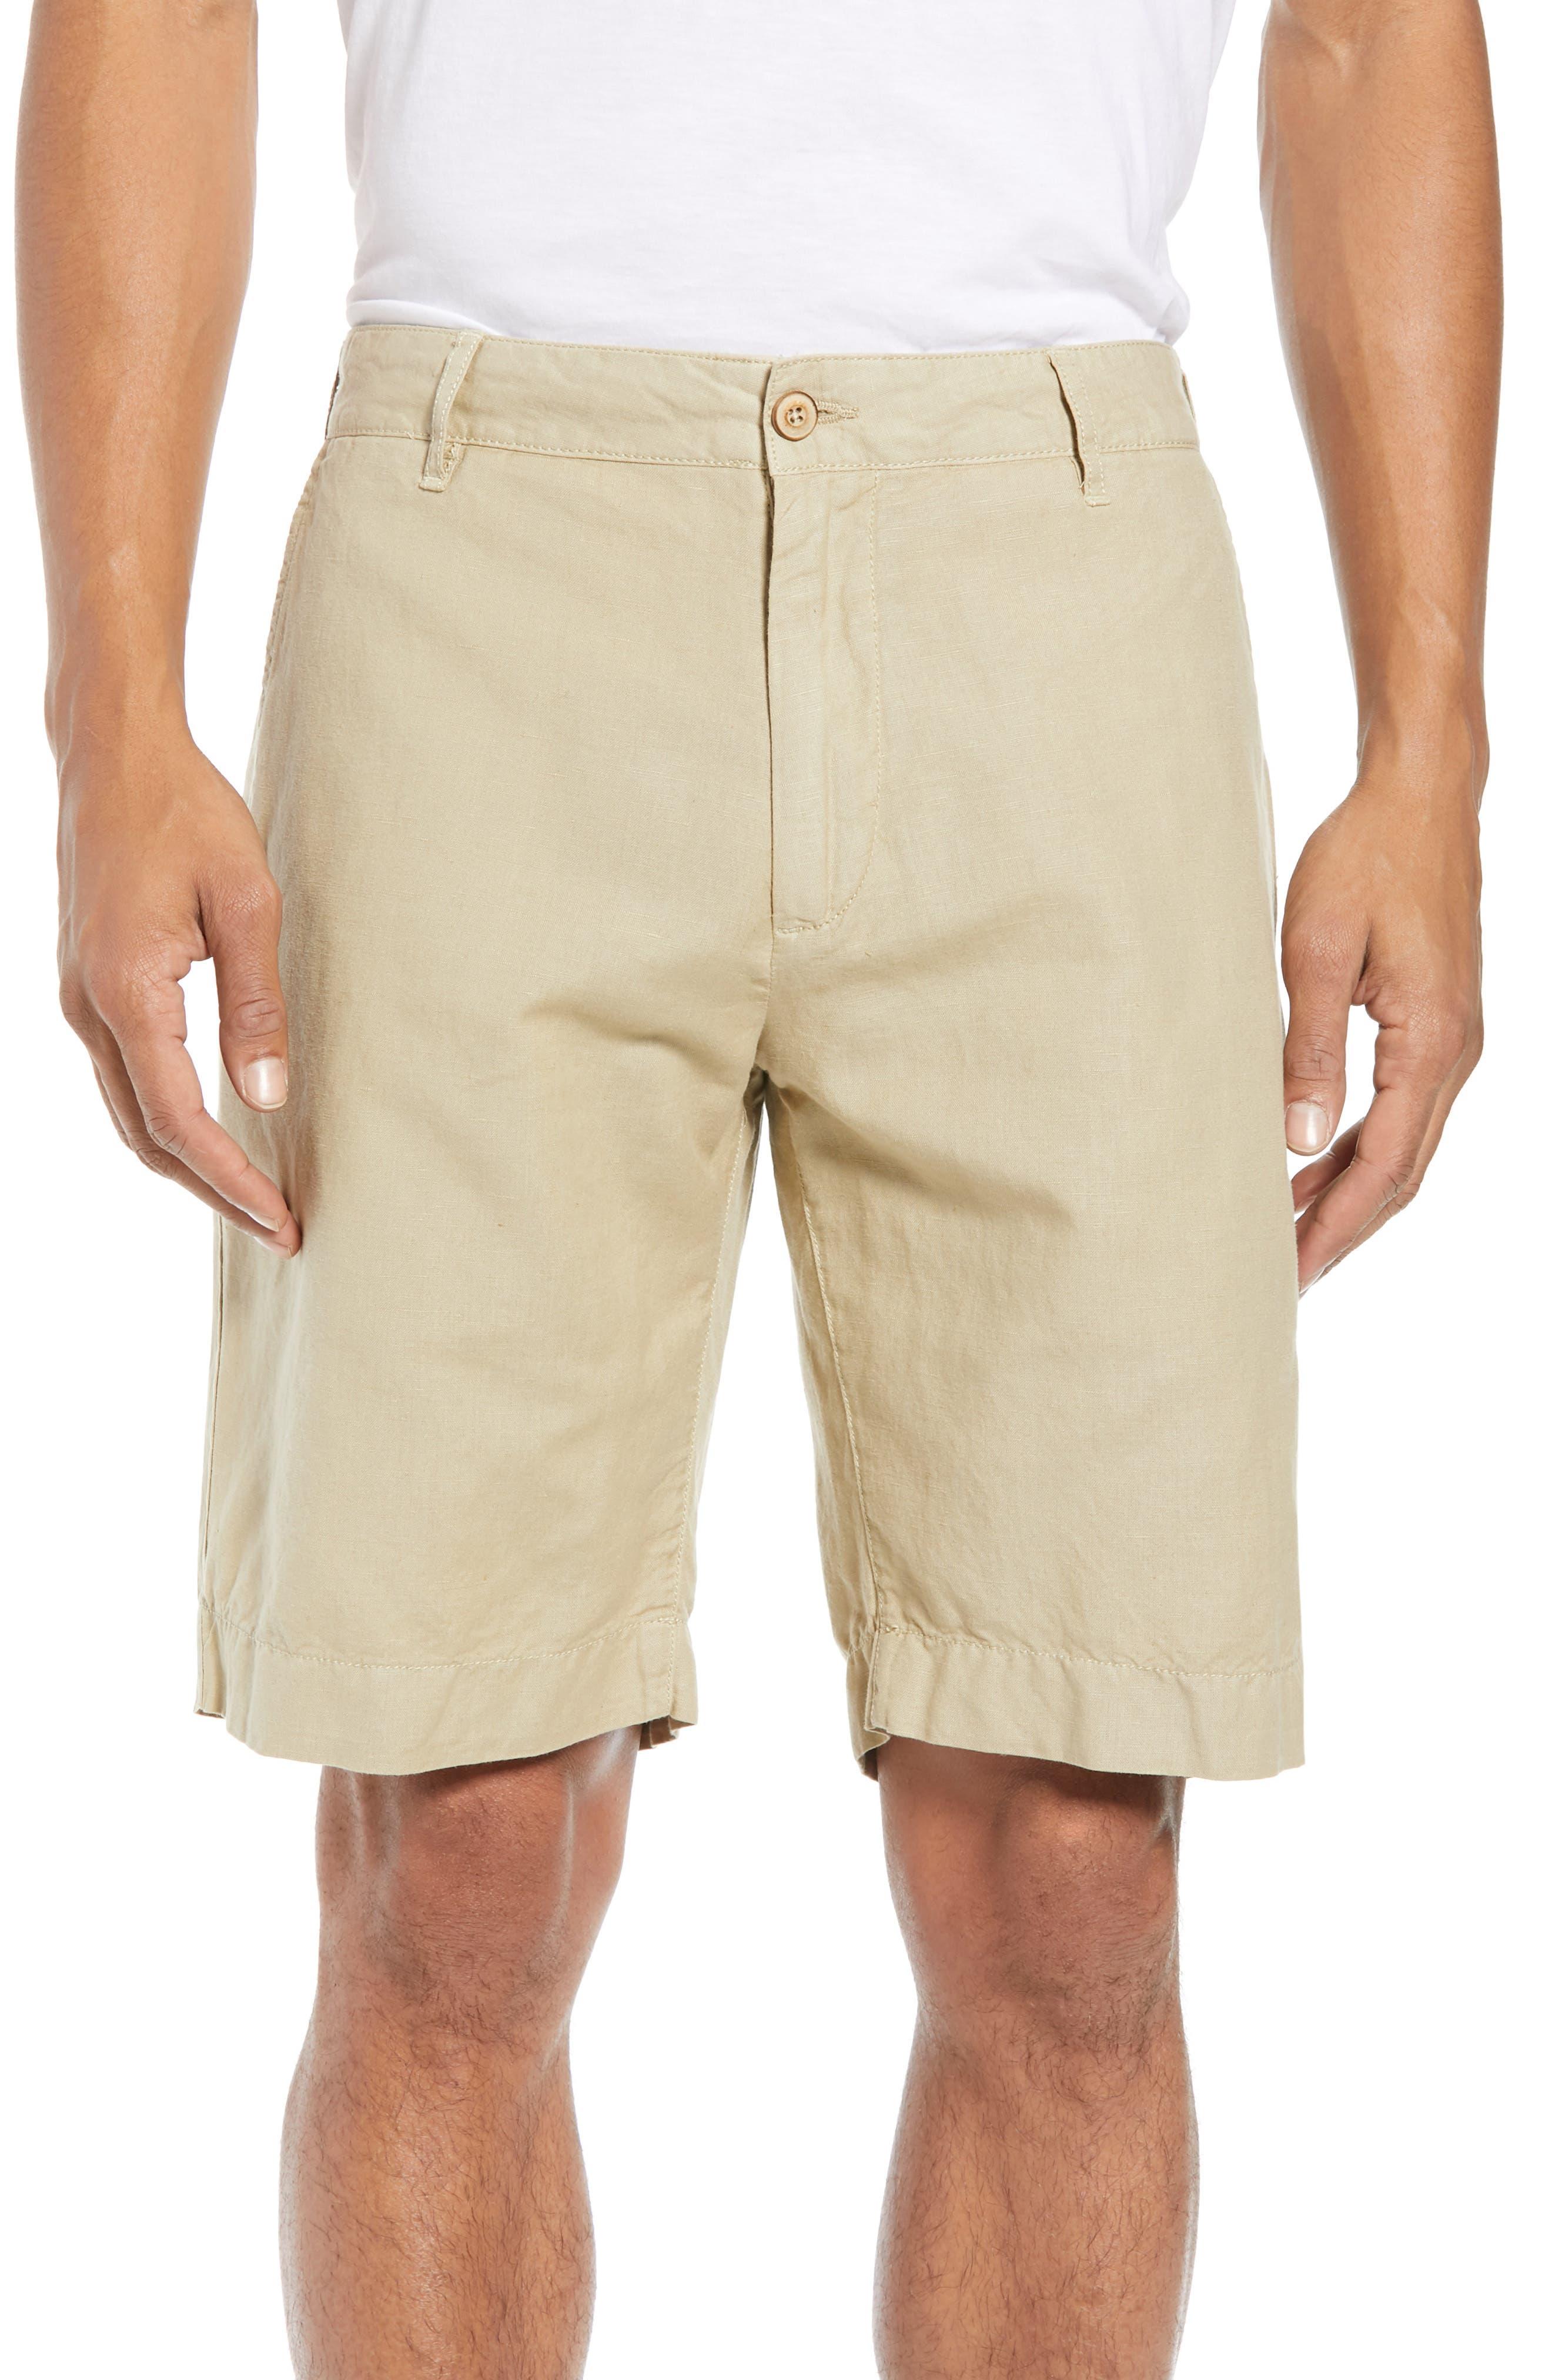 Malibu Shorts,                         Main,                         color, KHAKI